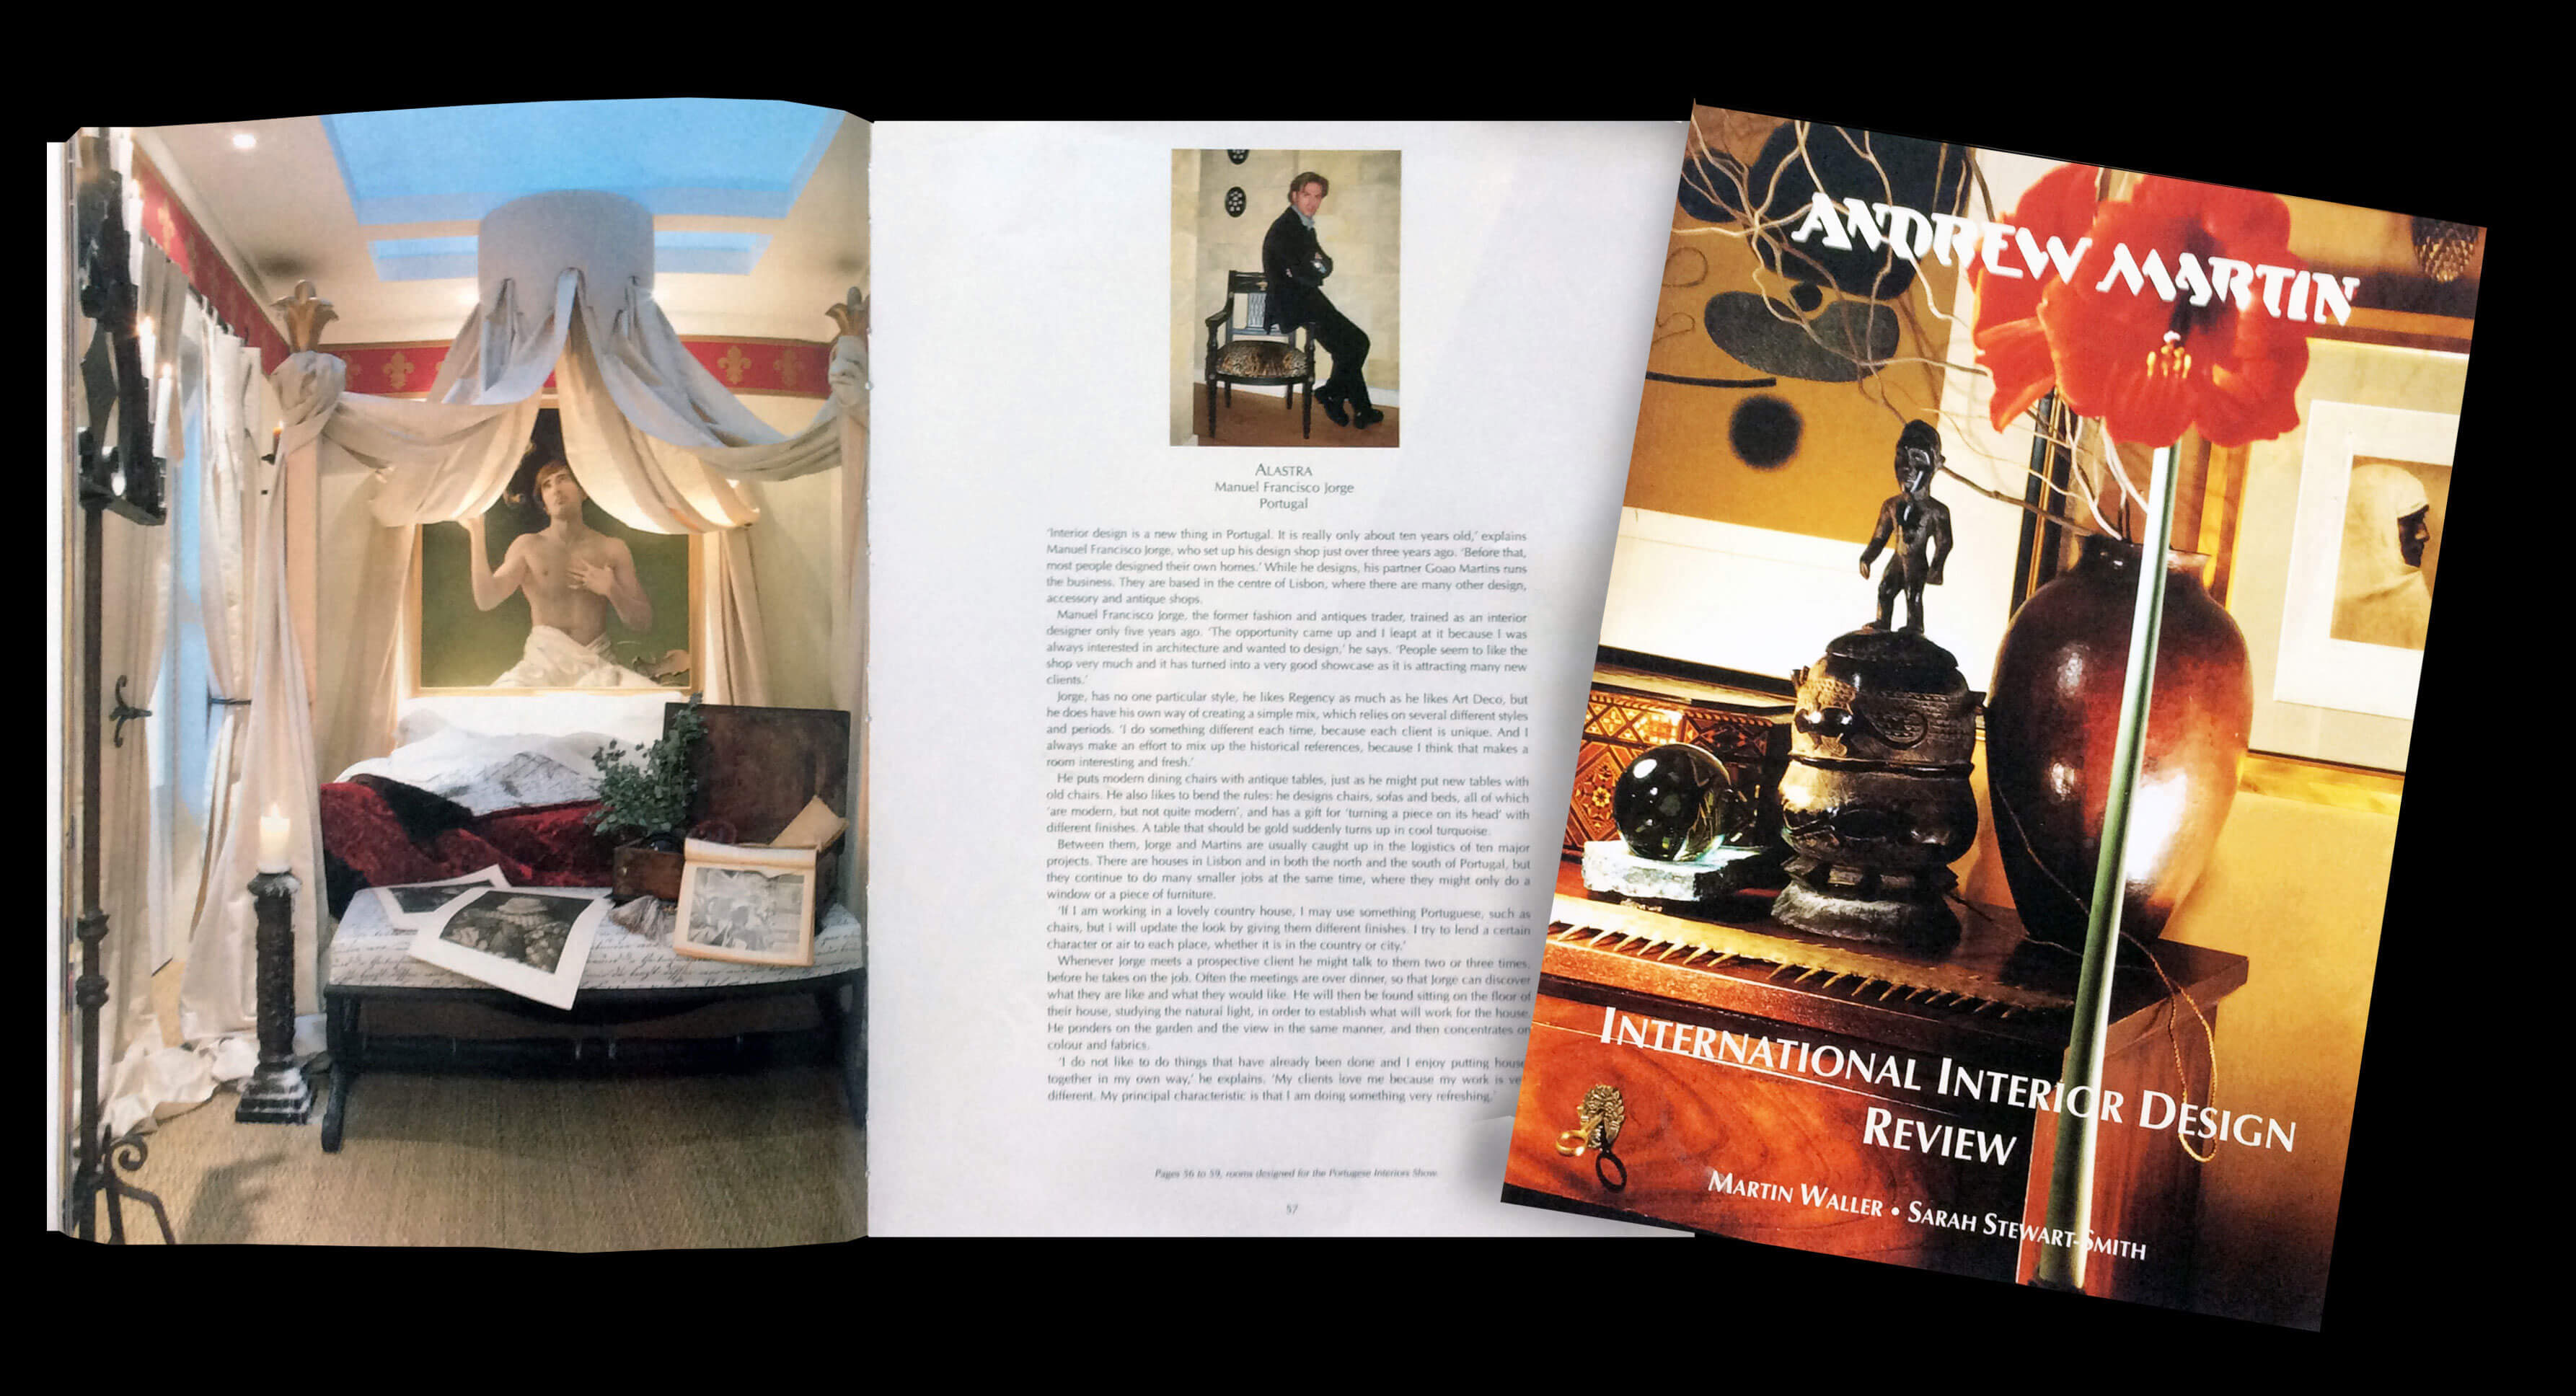 ANDREW MARTIN VOL2 98-a